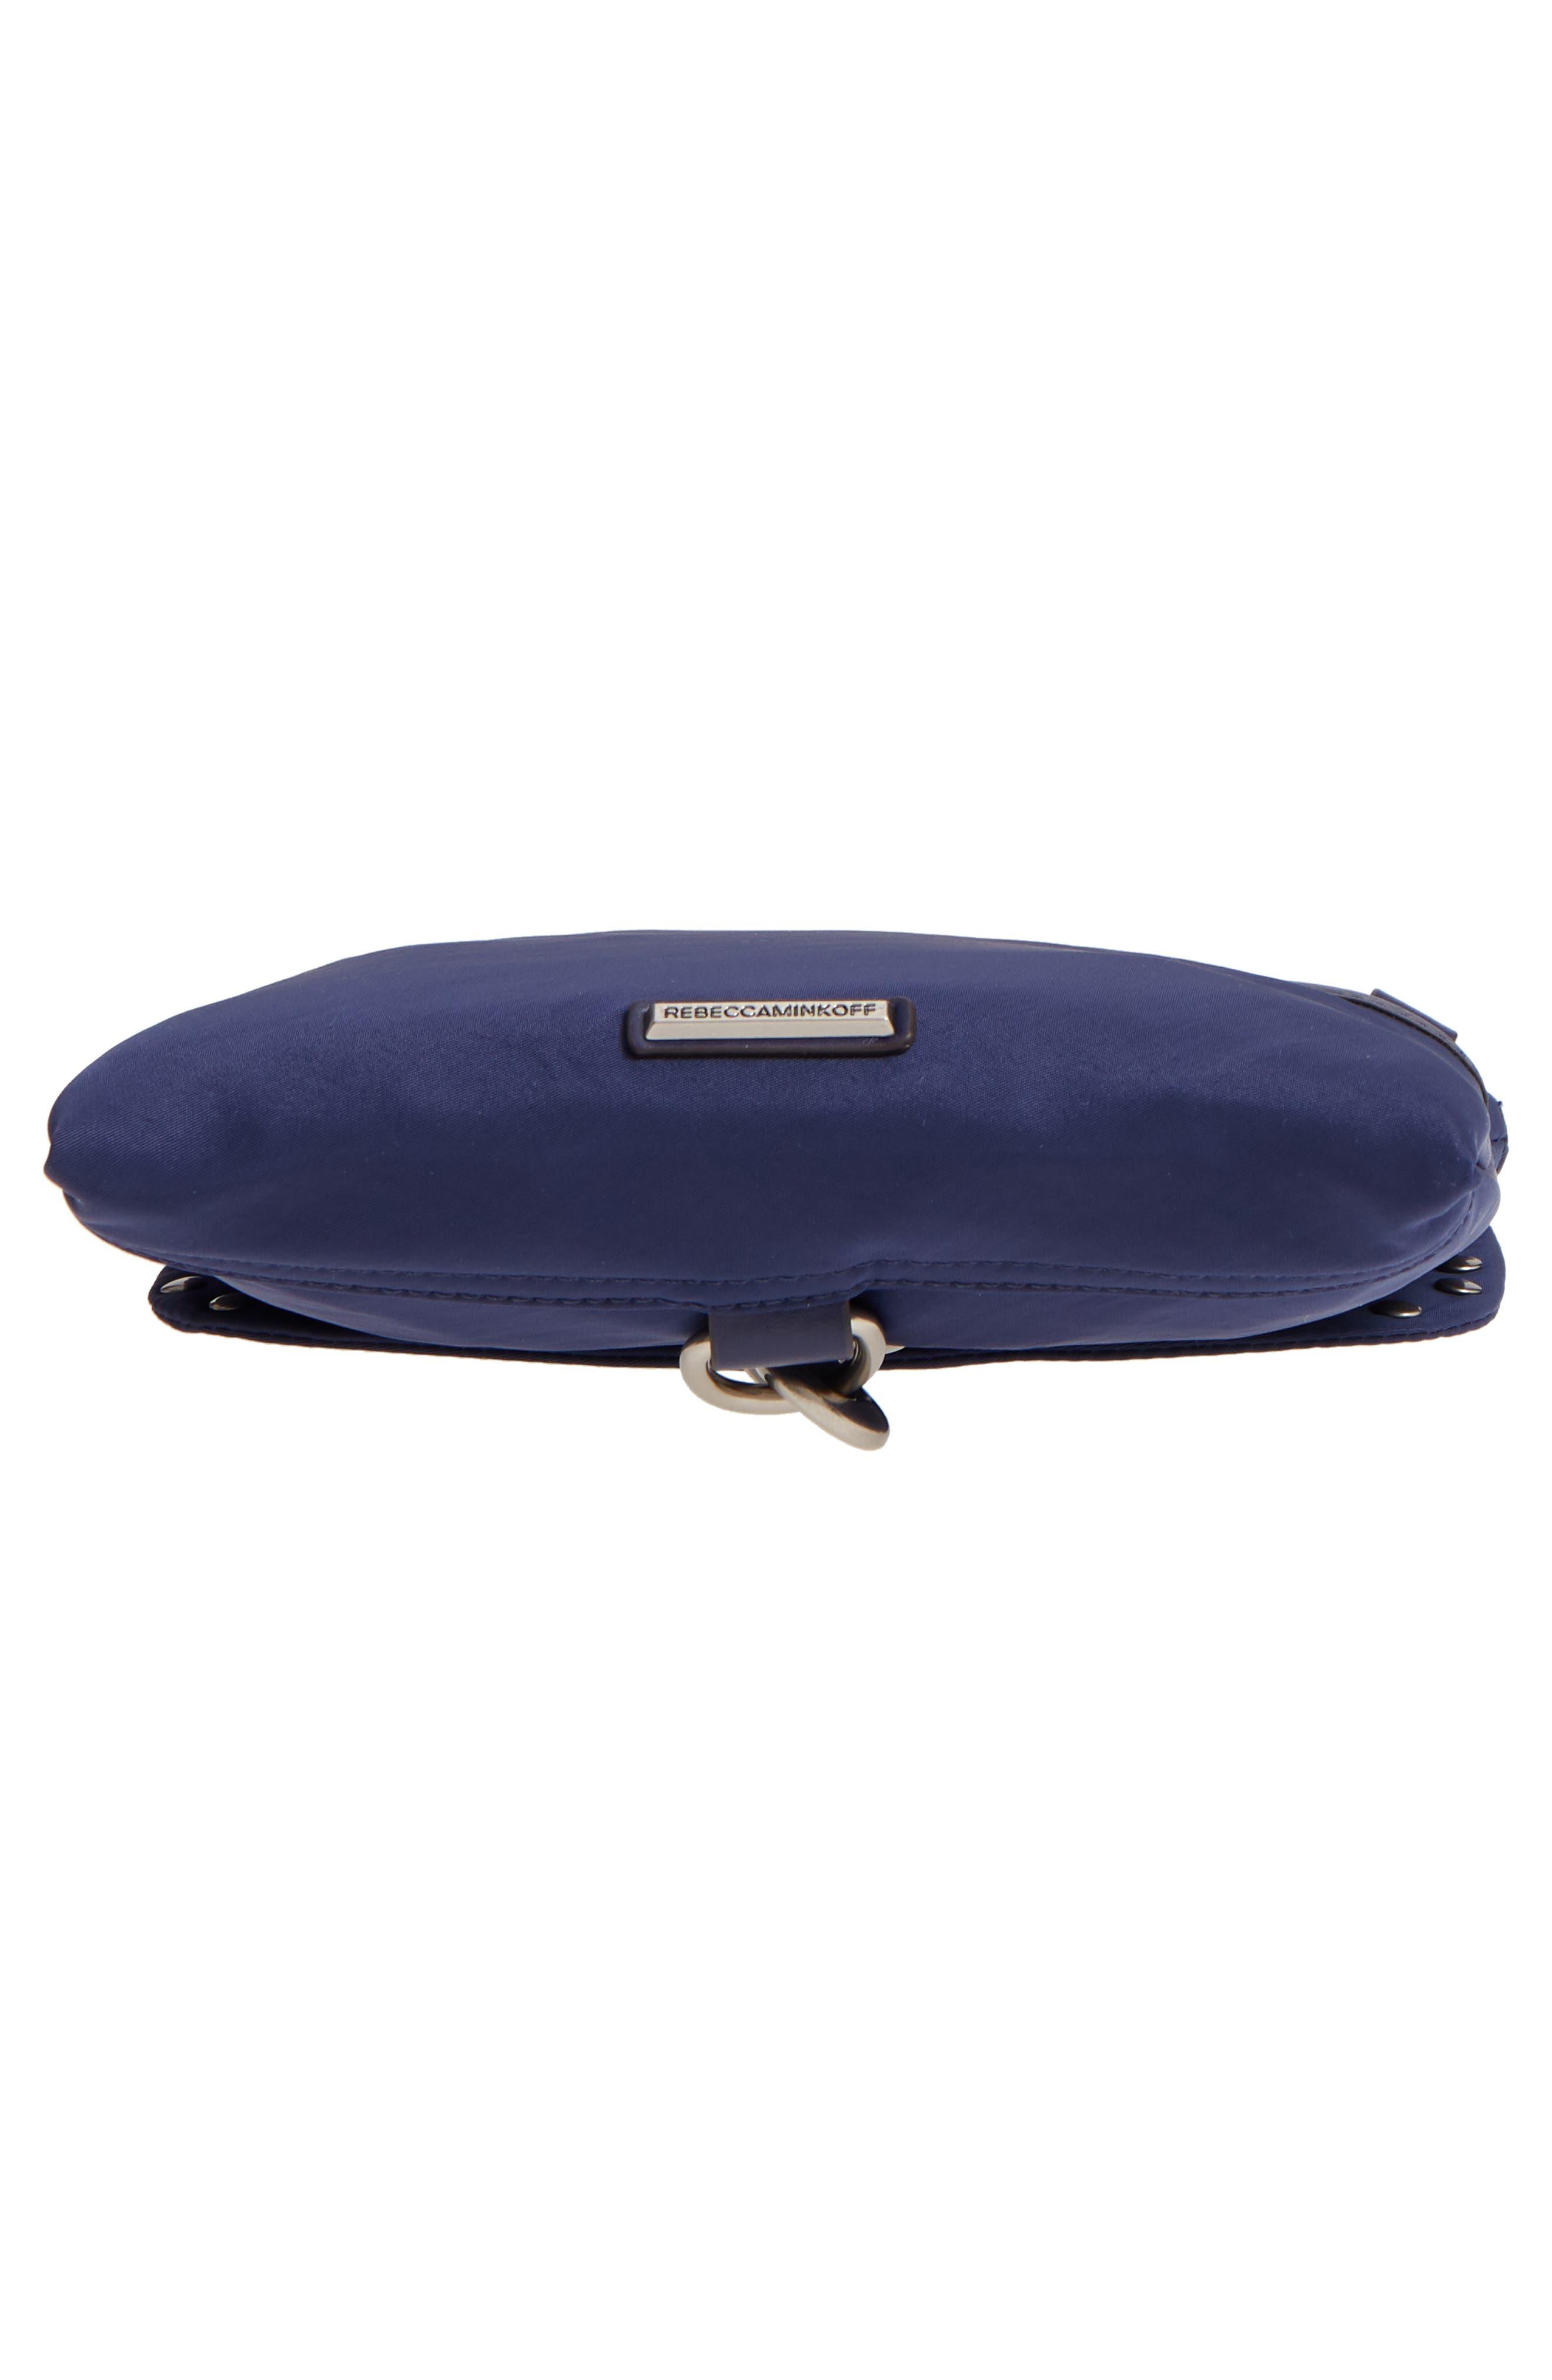 Nylon Flap Crossbody Bag,                             Alternate thumbnail 35, color,